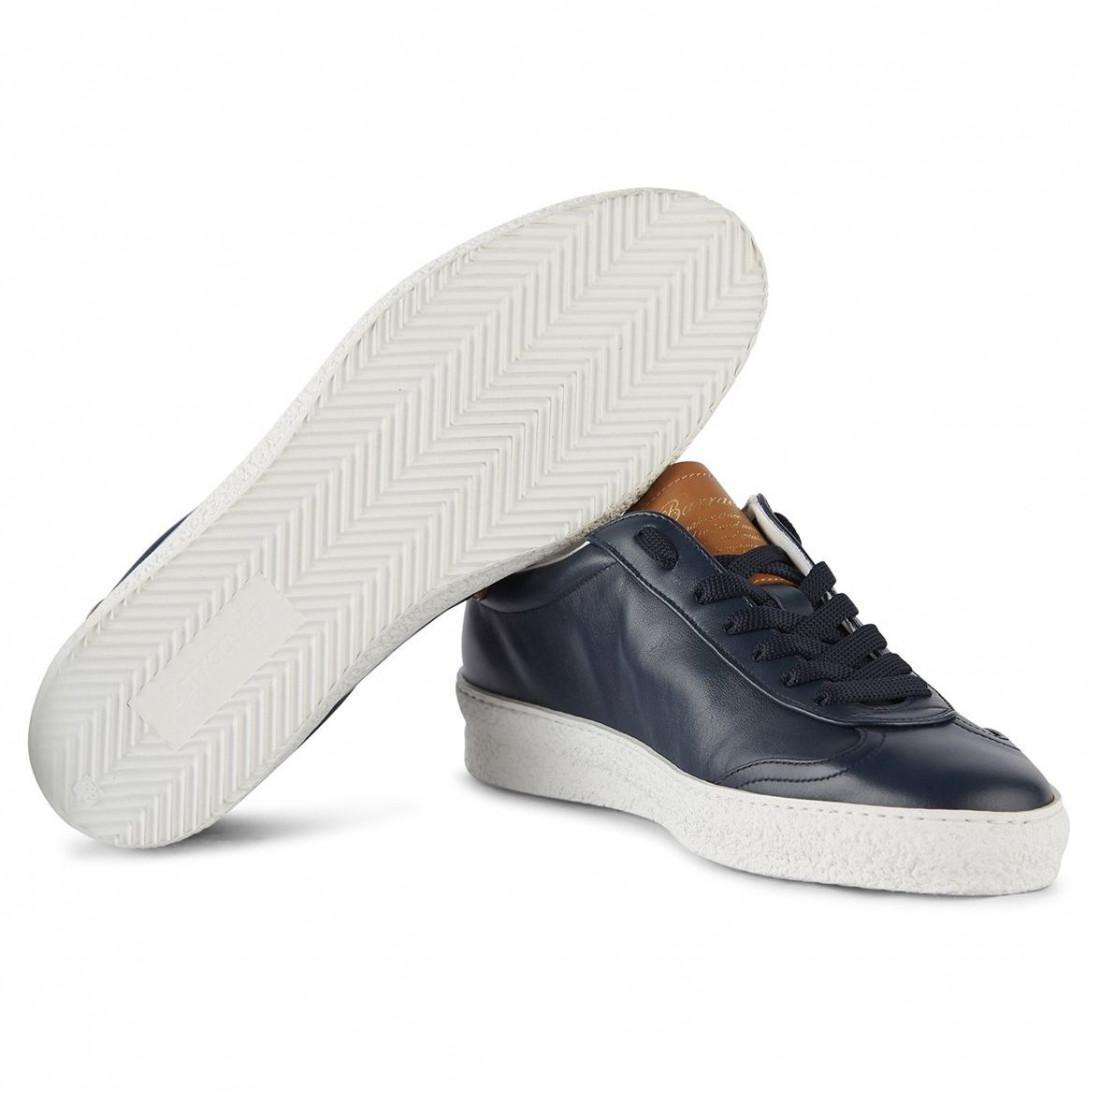 sneakers uomo barracuda bu3095d06pmt06ib30 4350